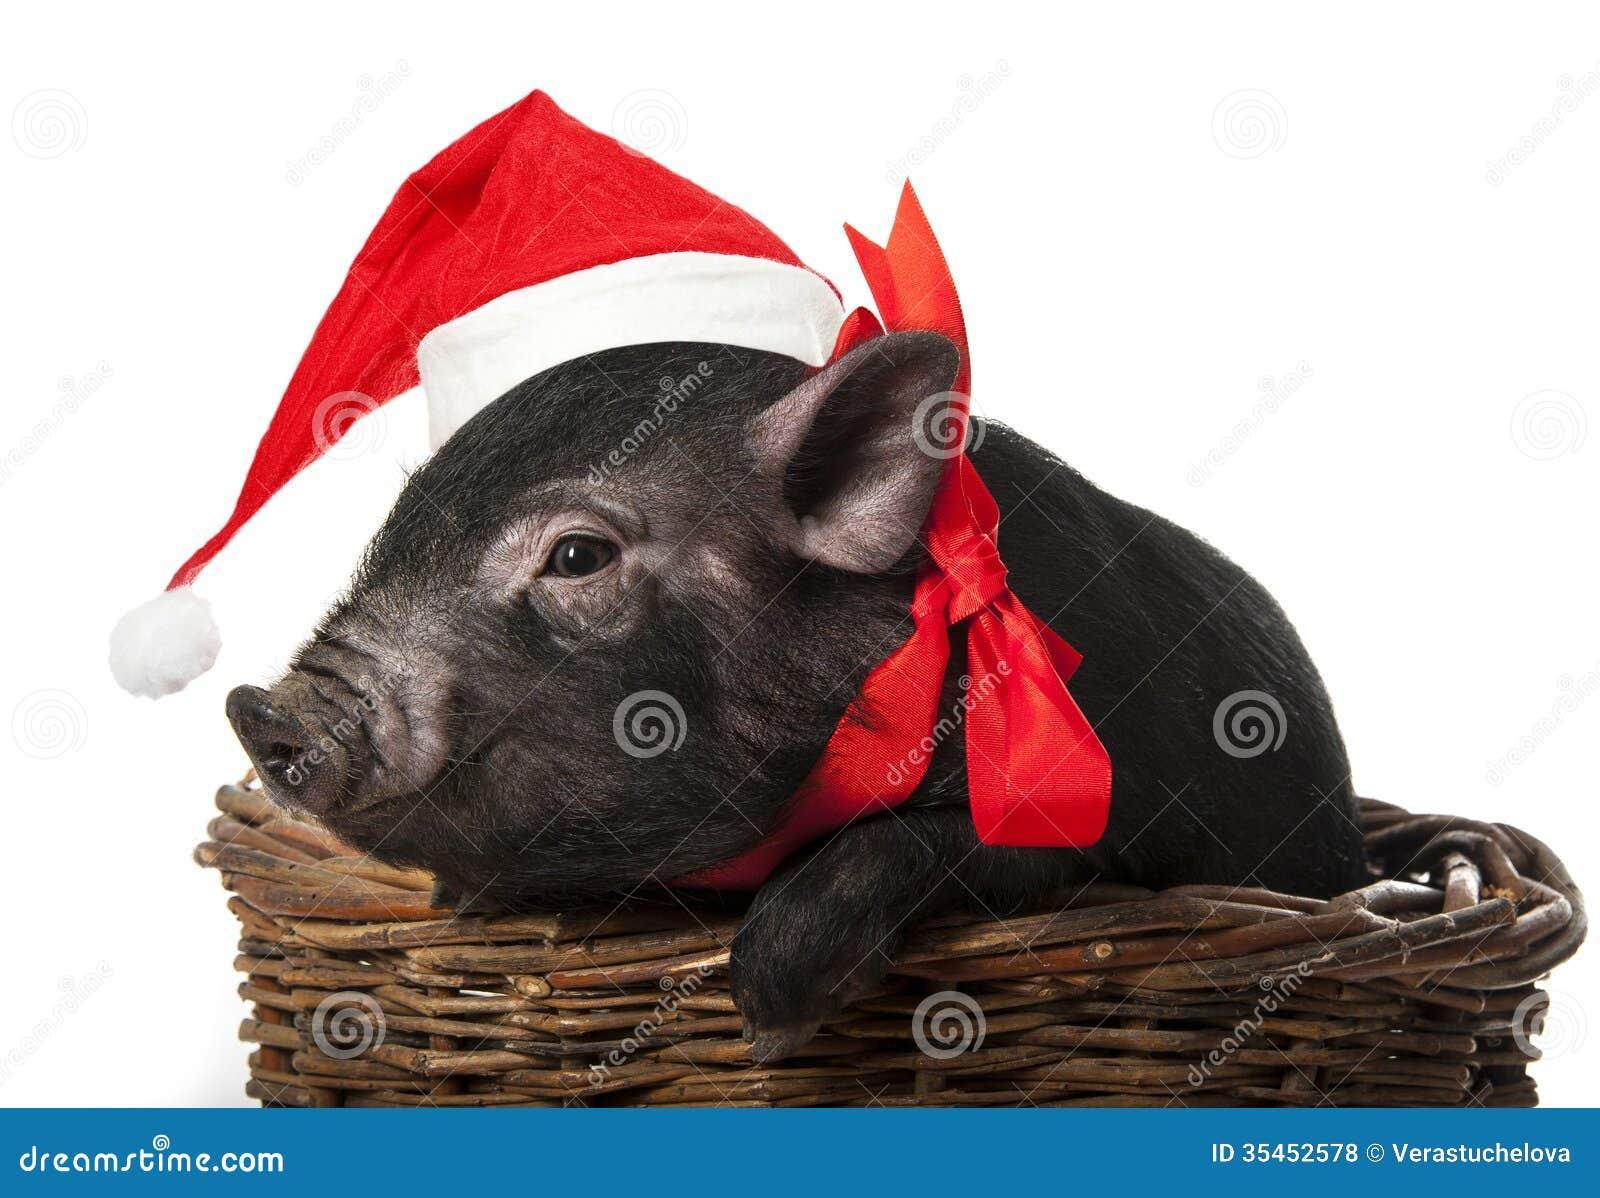 Cerdo negro con un casquillo rojo de santa